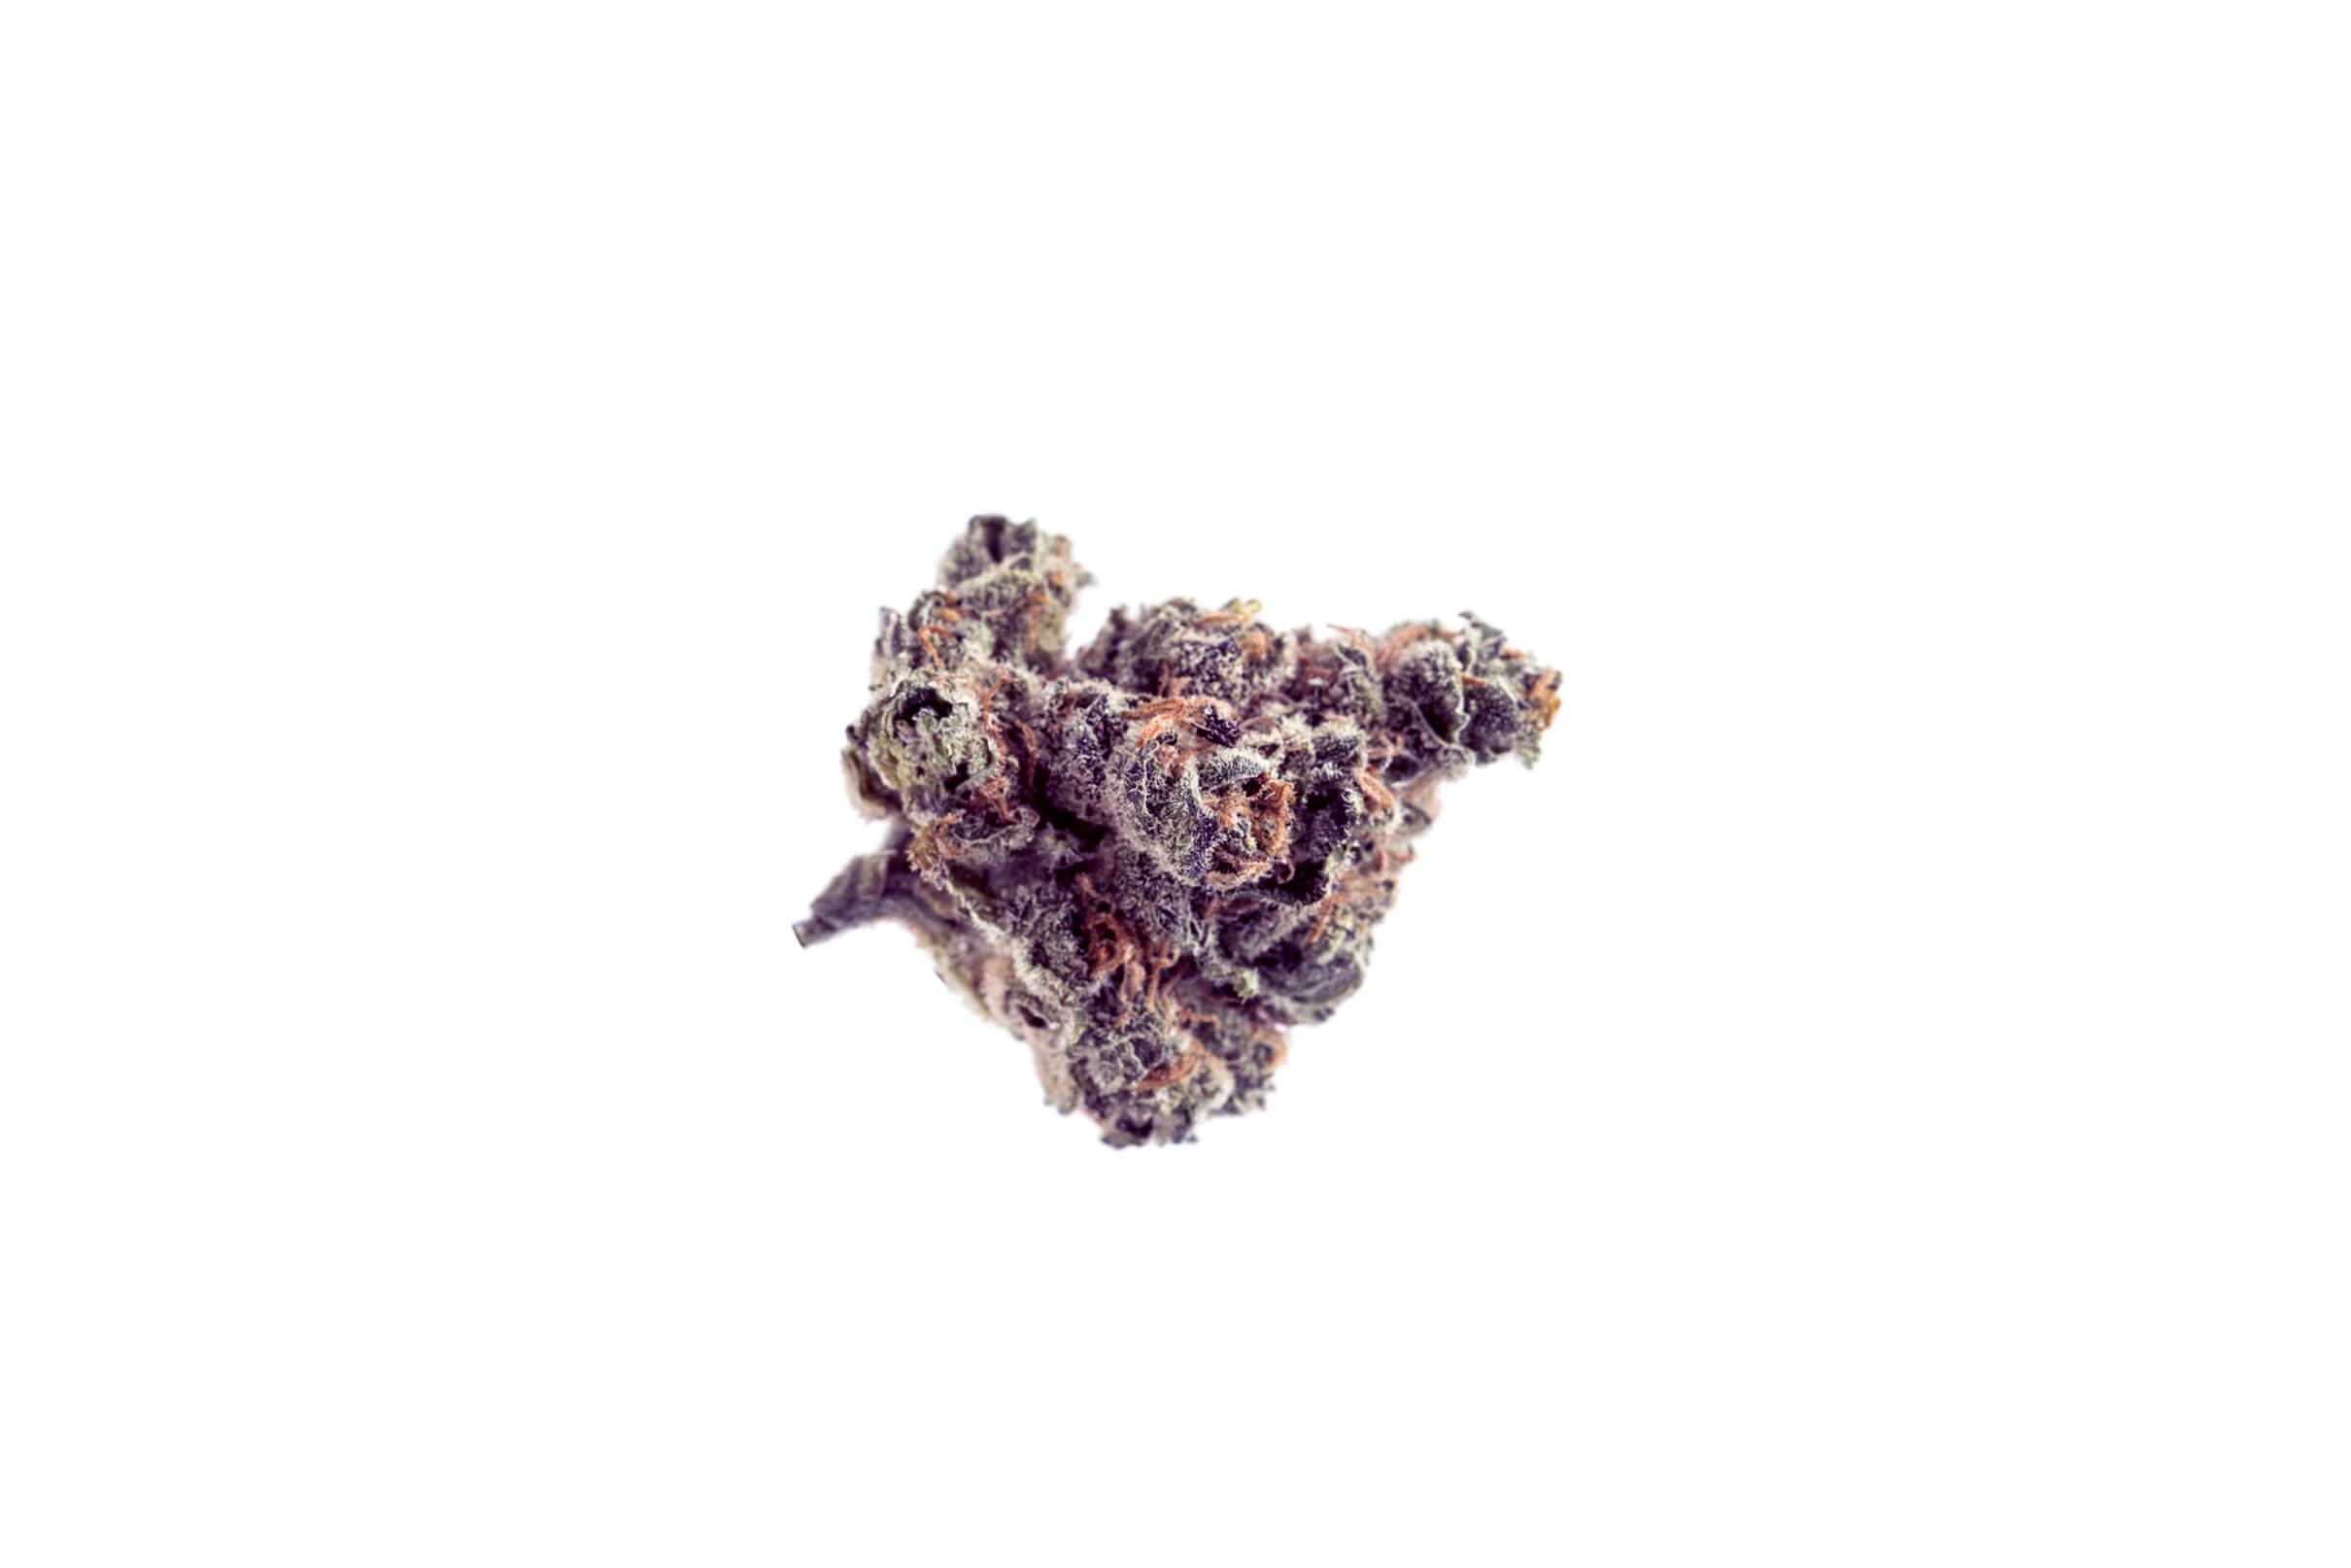 Blueberry Muffin strain photo 1